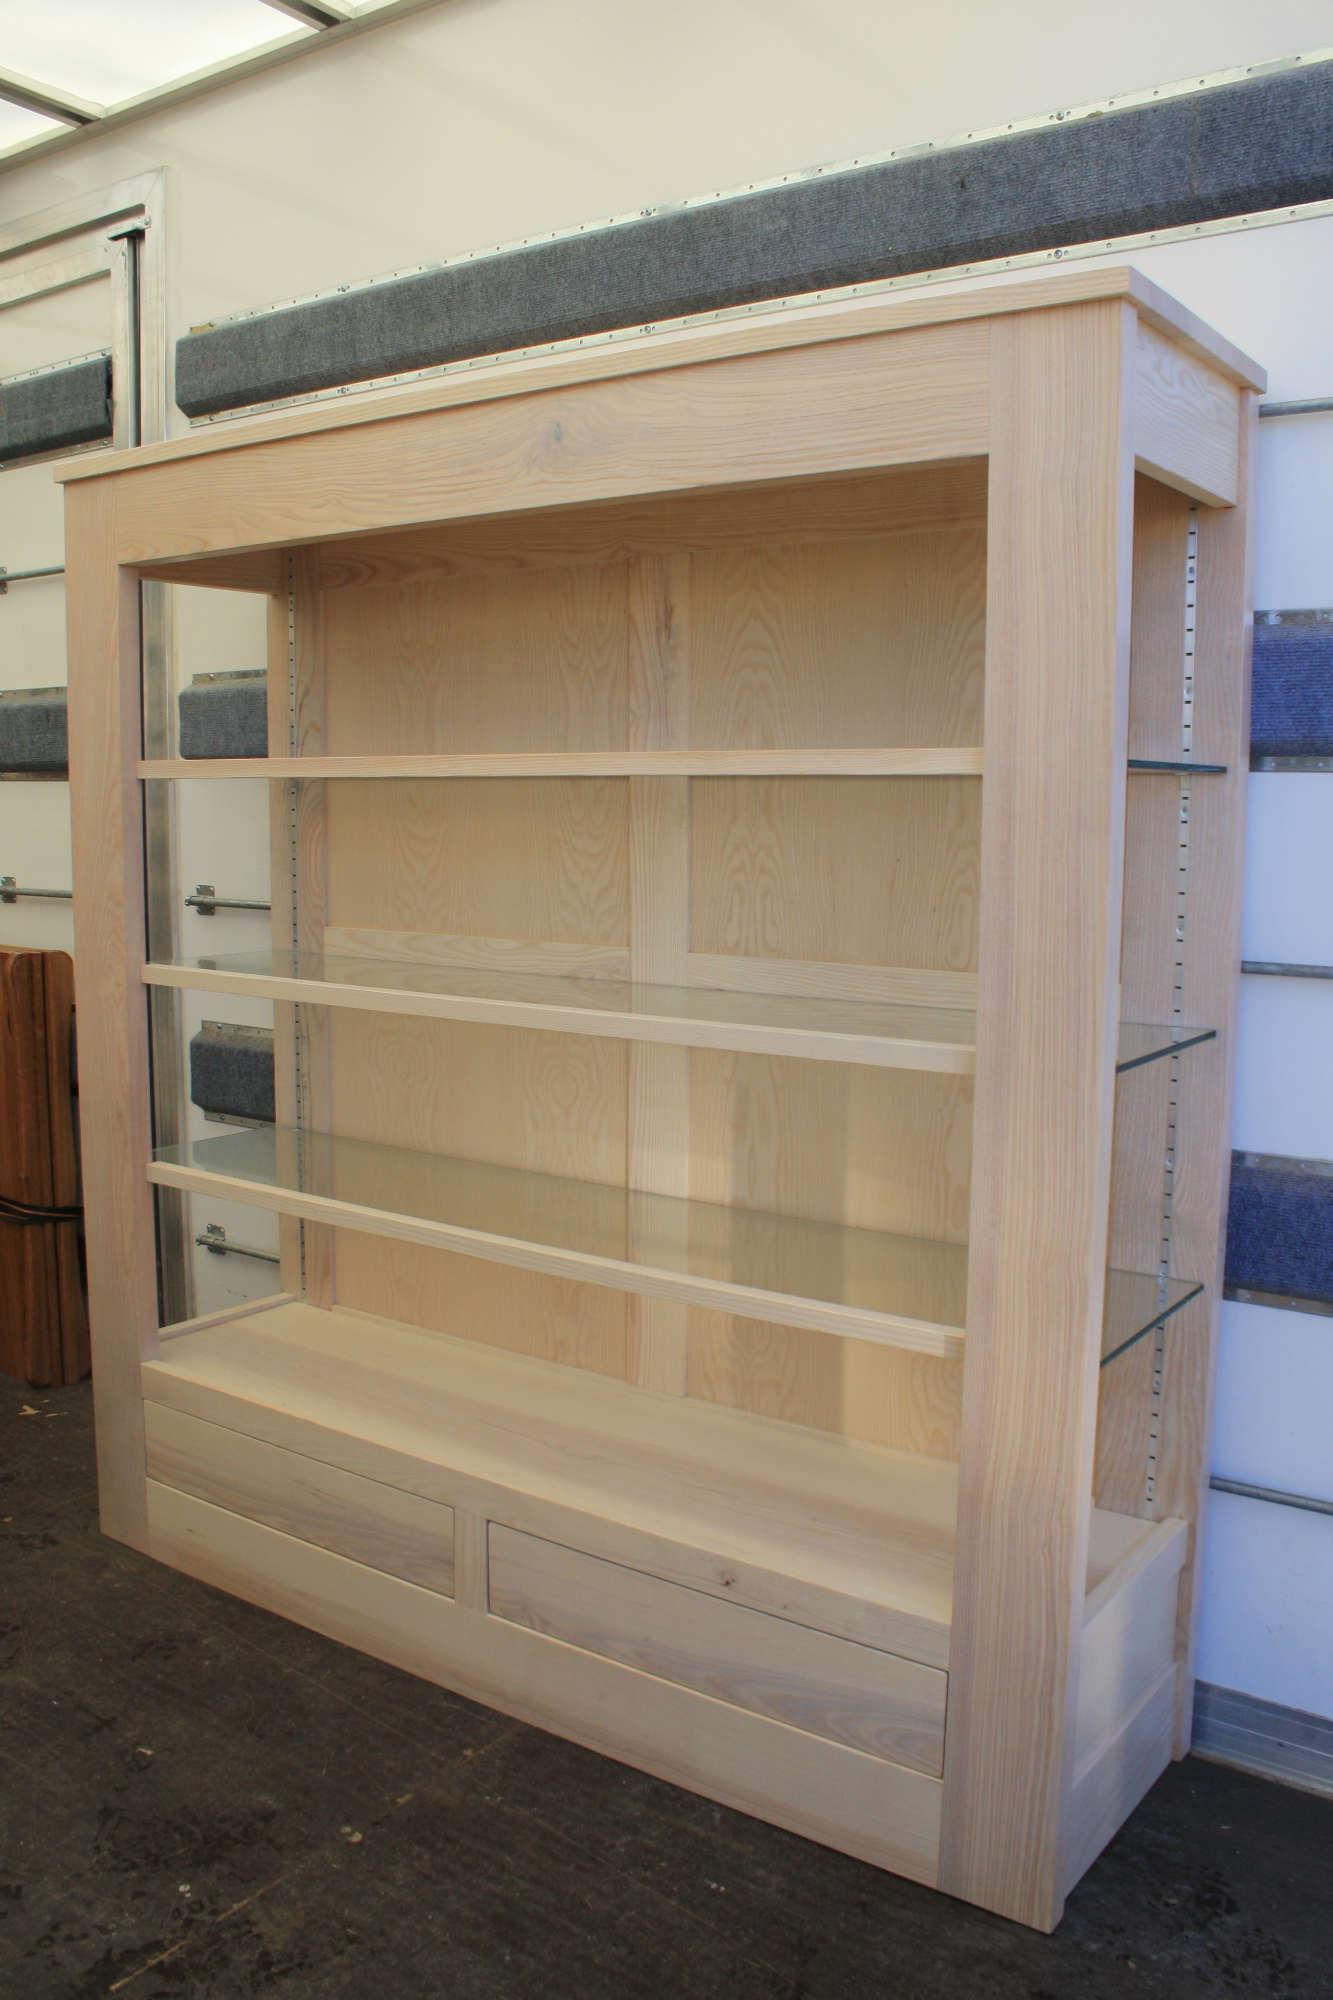 meuble nevers meubles dufour menuiserie placard tiroir dressing. Black Bedroom Furniture Sets. Home Design Ideas